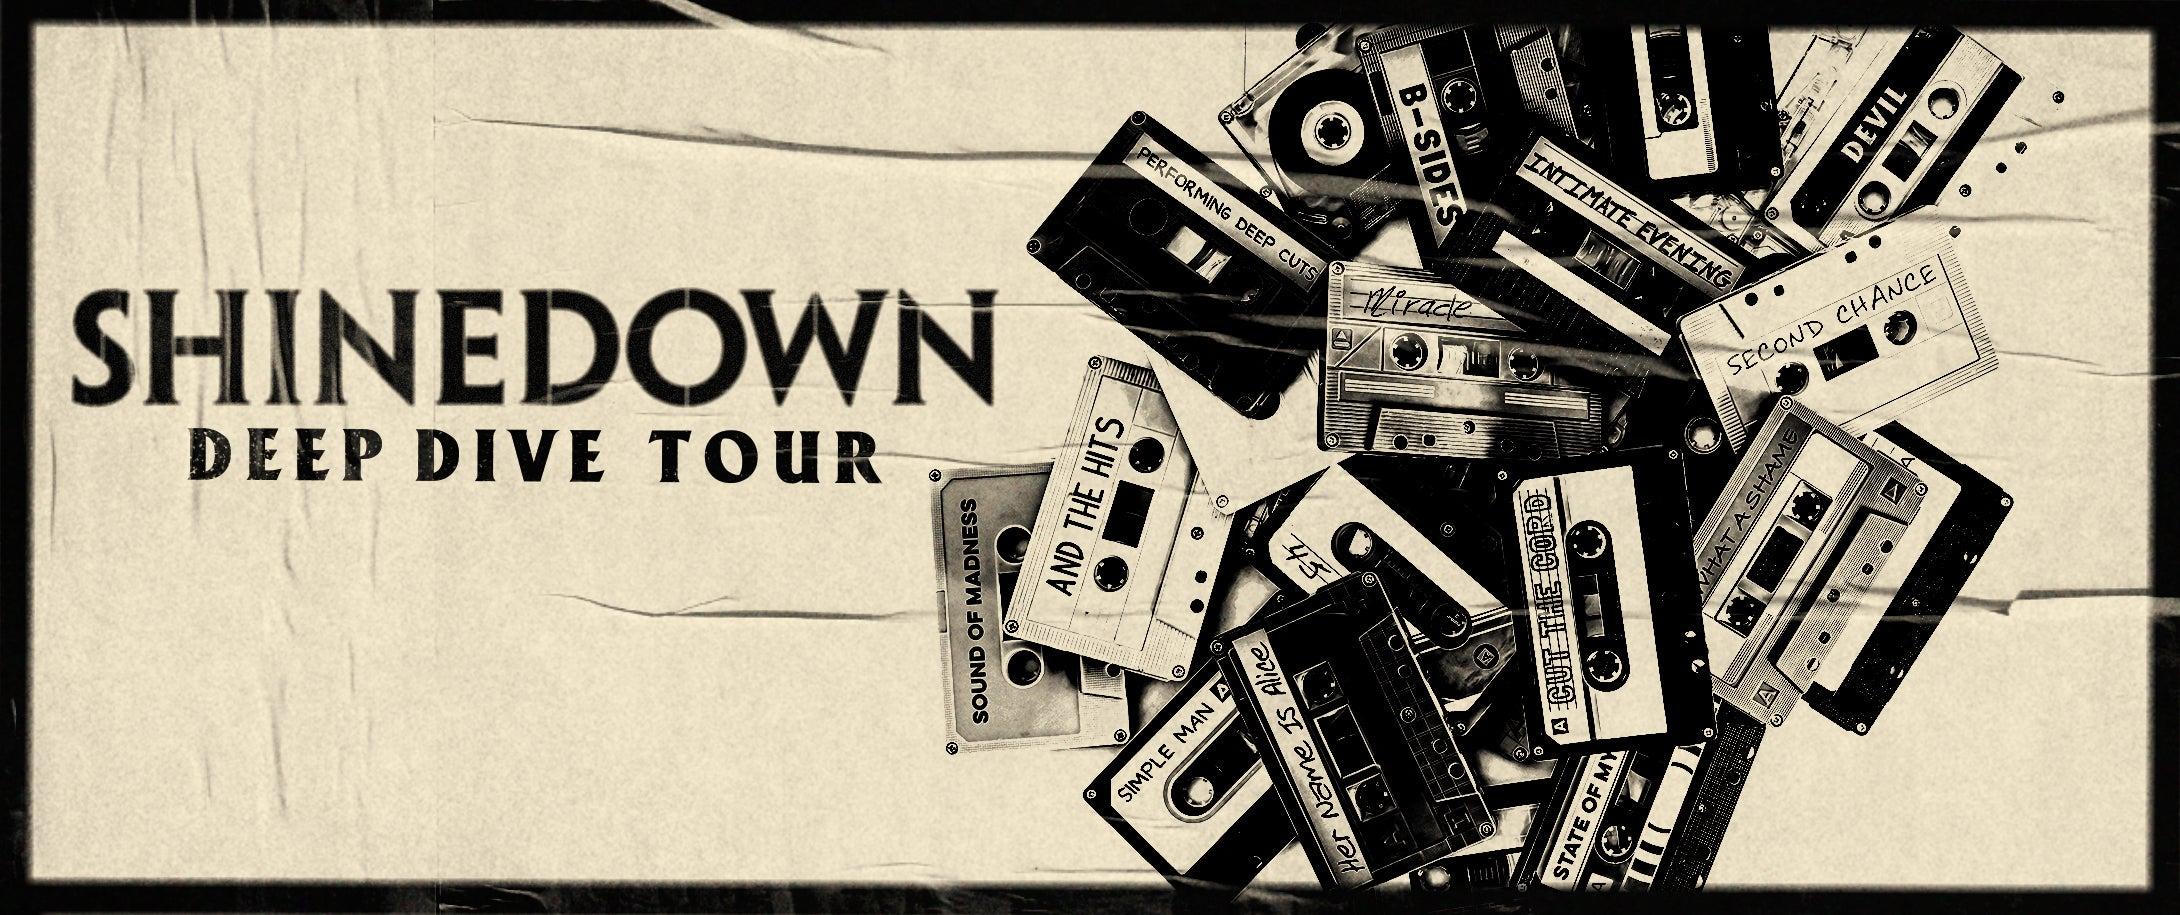 CANCELED - Shinedown: Deep Dive